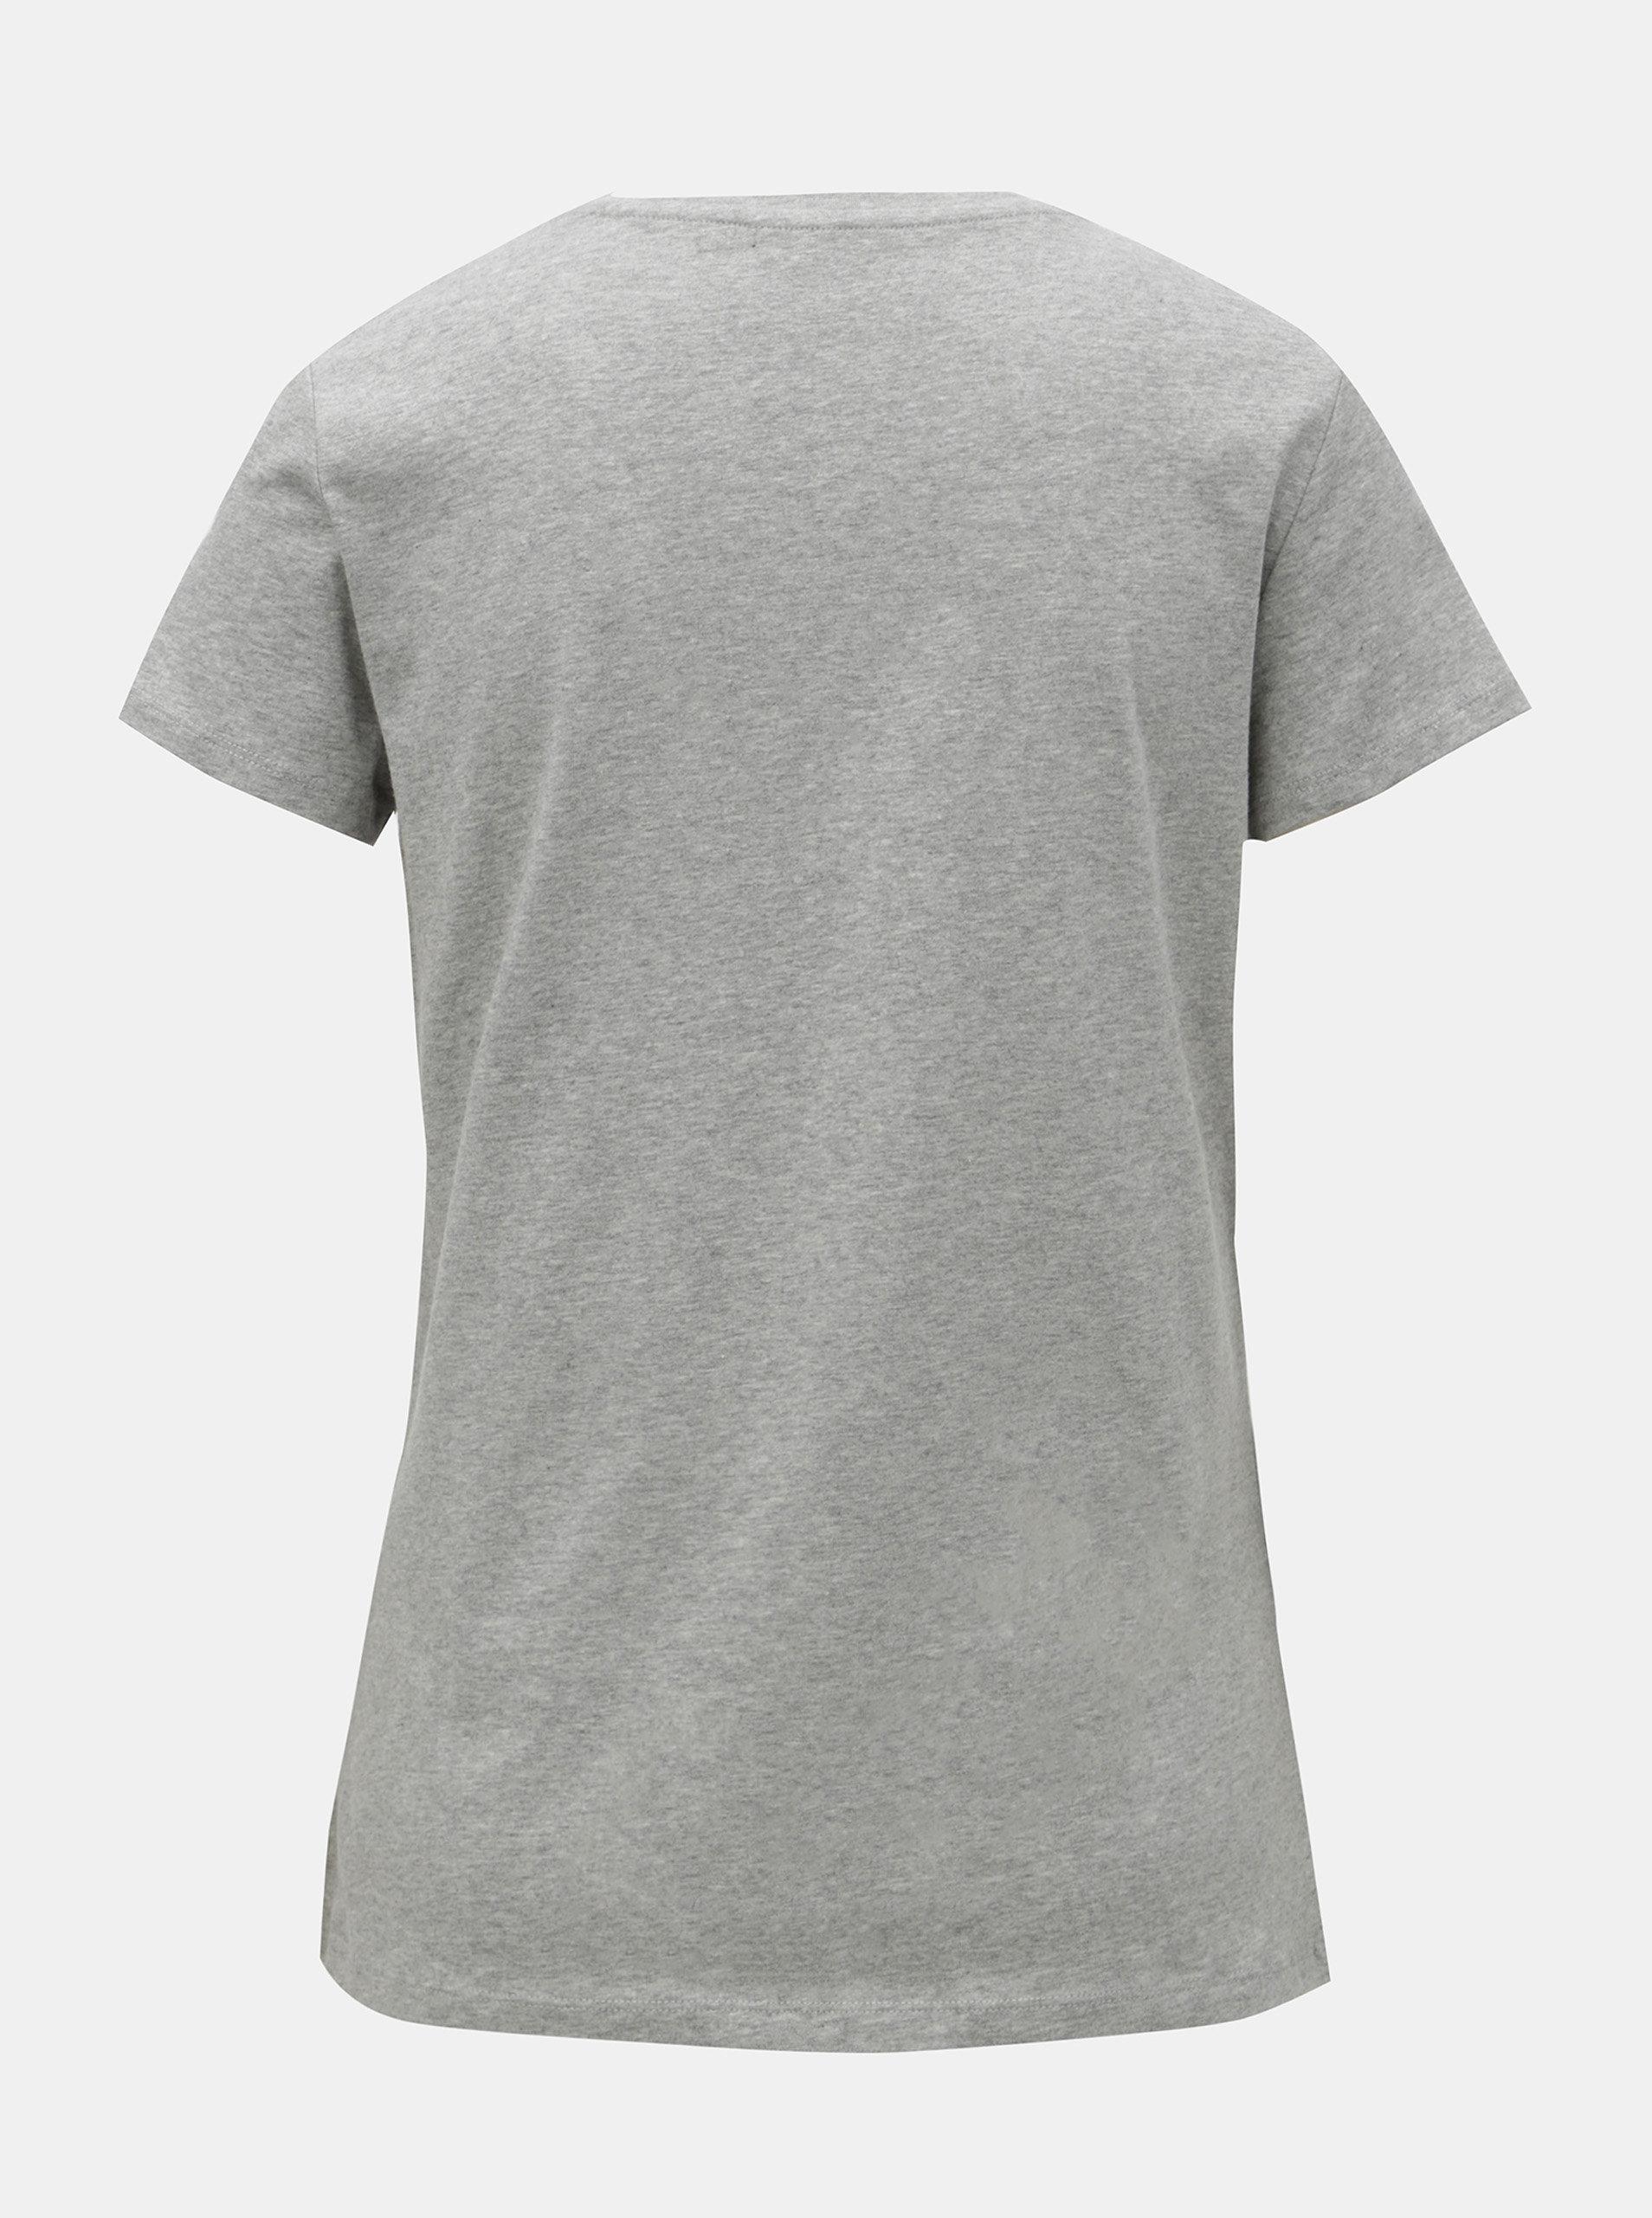 e818f3363 Sivé dámske melírované basic tričko s krátkym rukávom GANT   ZOOT.sk